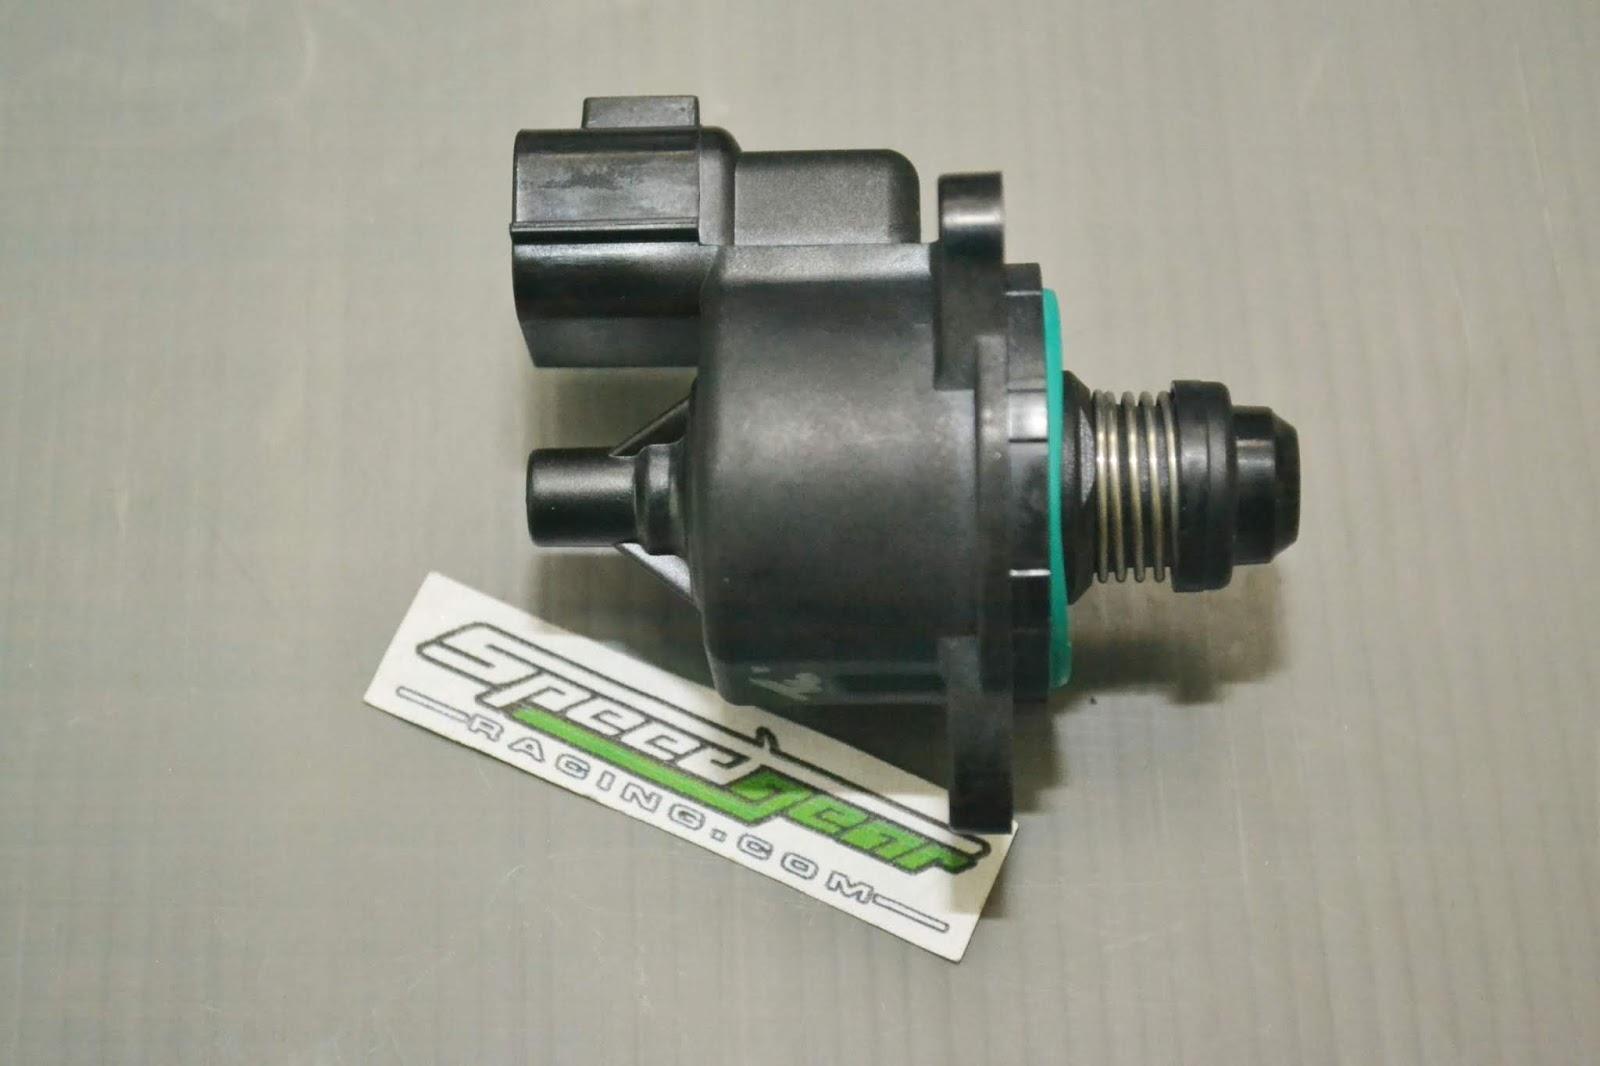 Speedgear Racing: Stepper motor Idle valve 4G63 4G63T Lancer